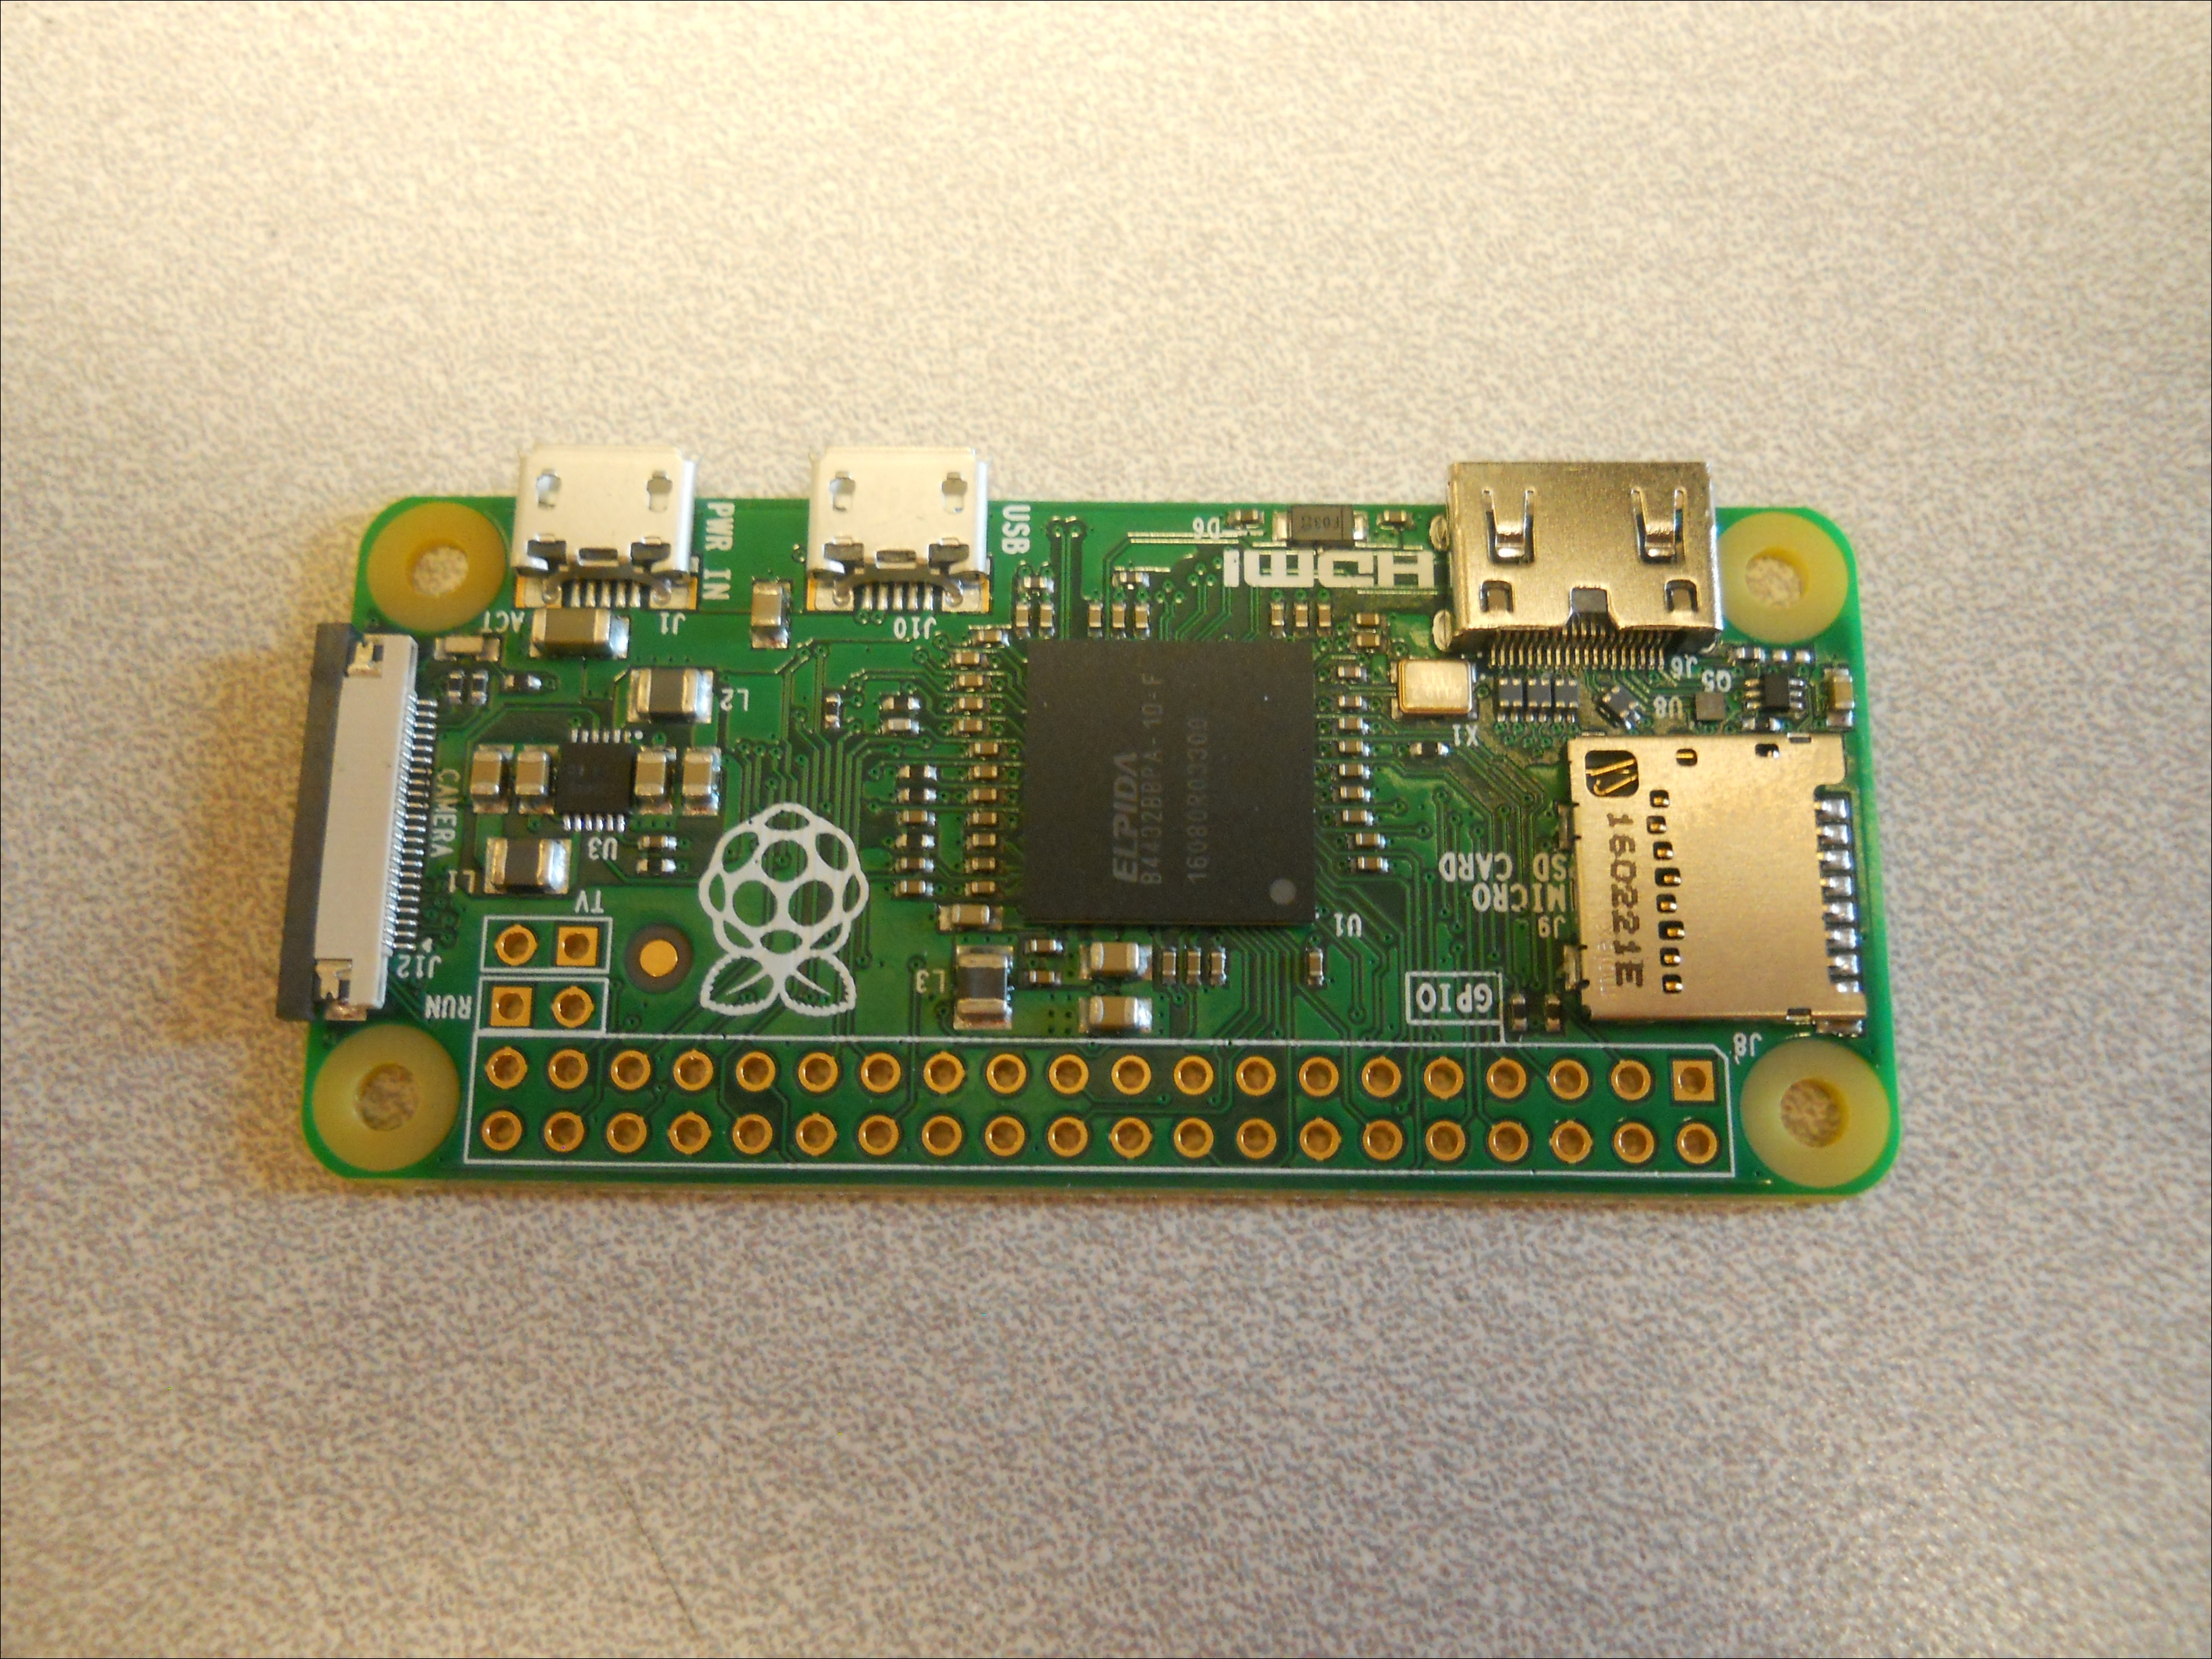 Setting up the Raspberry Pi Zero - Raspberry Pi Robotic